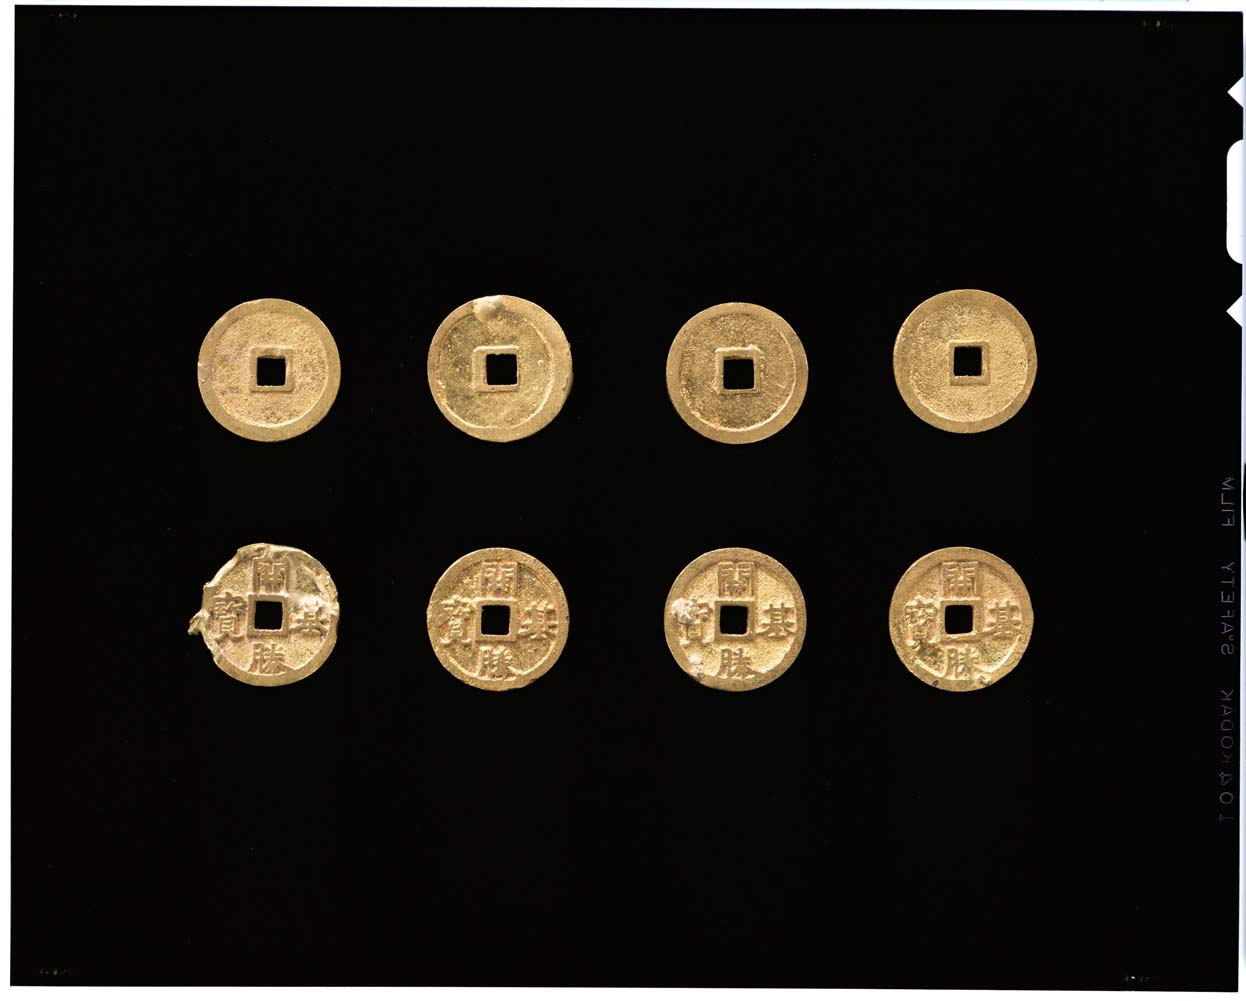 C0010298 開基勝宝(金銭) - 東京国立博物館 画像検索